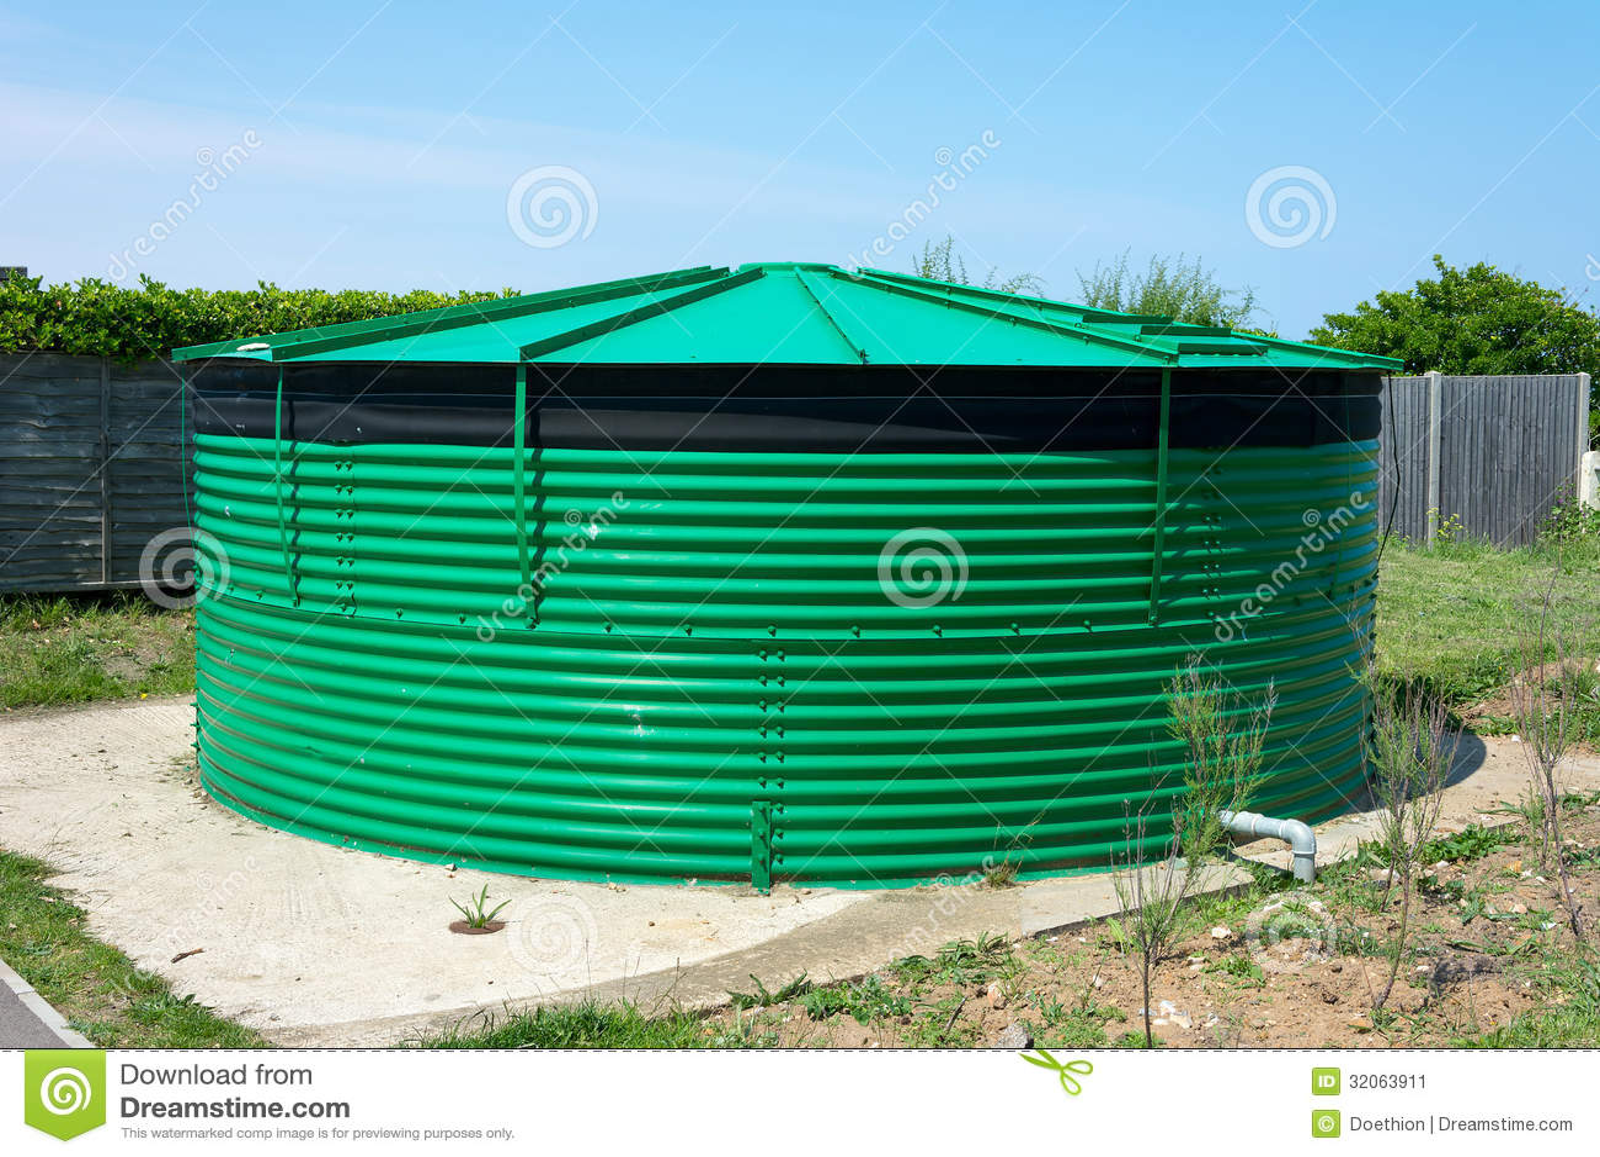 Water Tank Irrigation System : Sprinkler underground tfm test and the statute